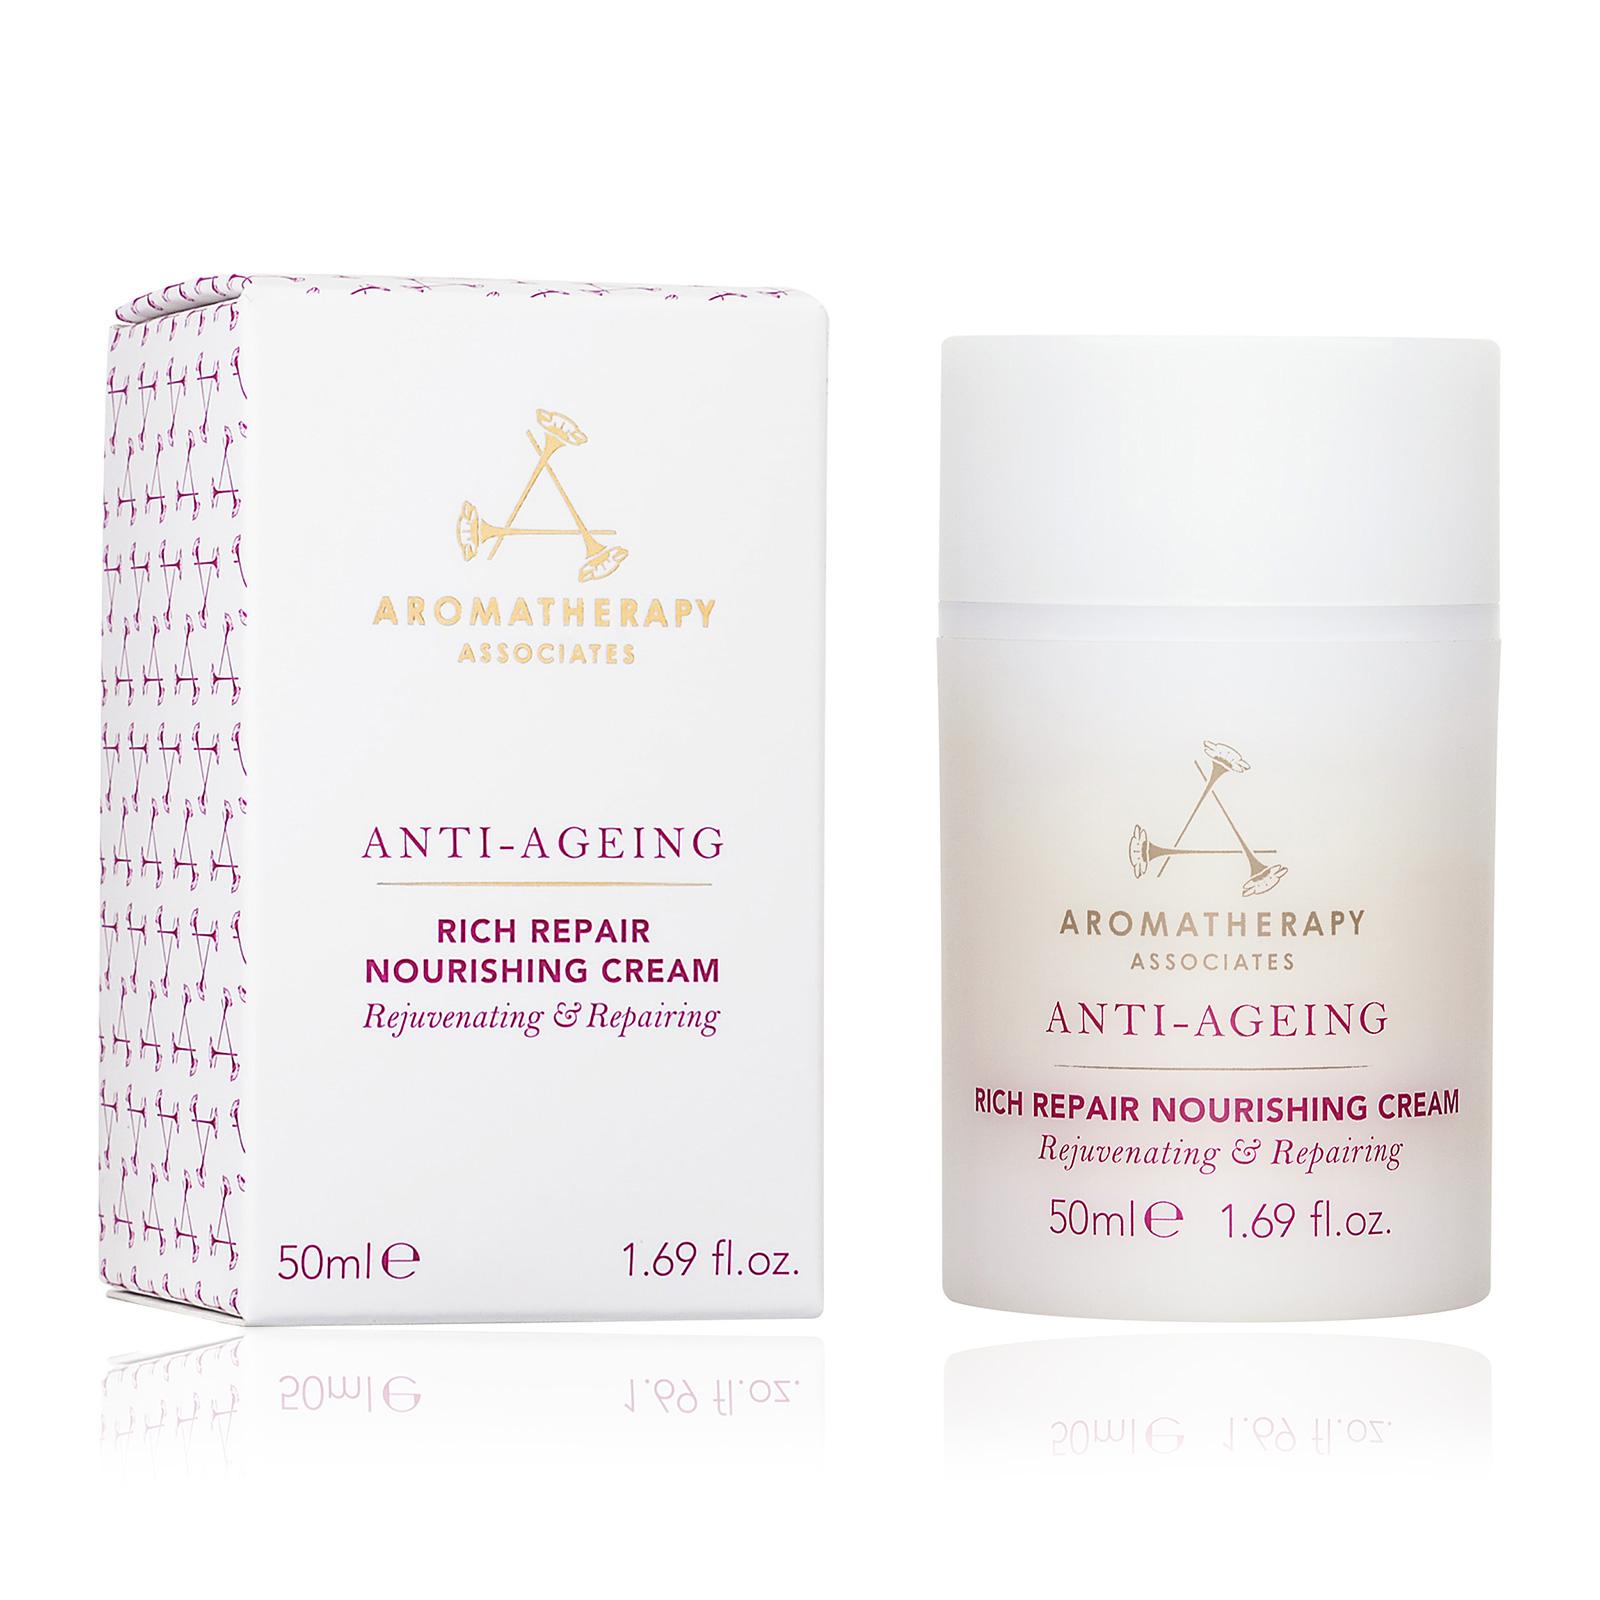 Anti-Ageing Rich Repair Nourishing Cream